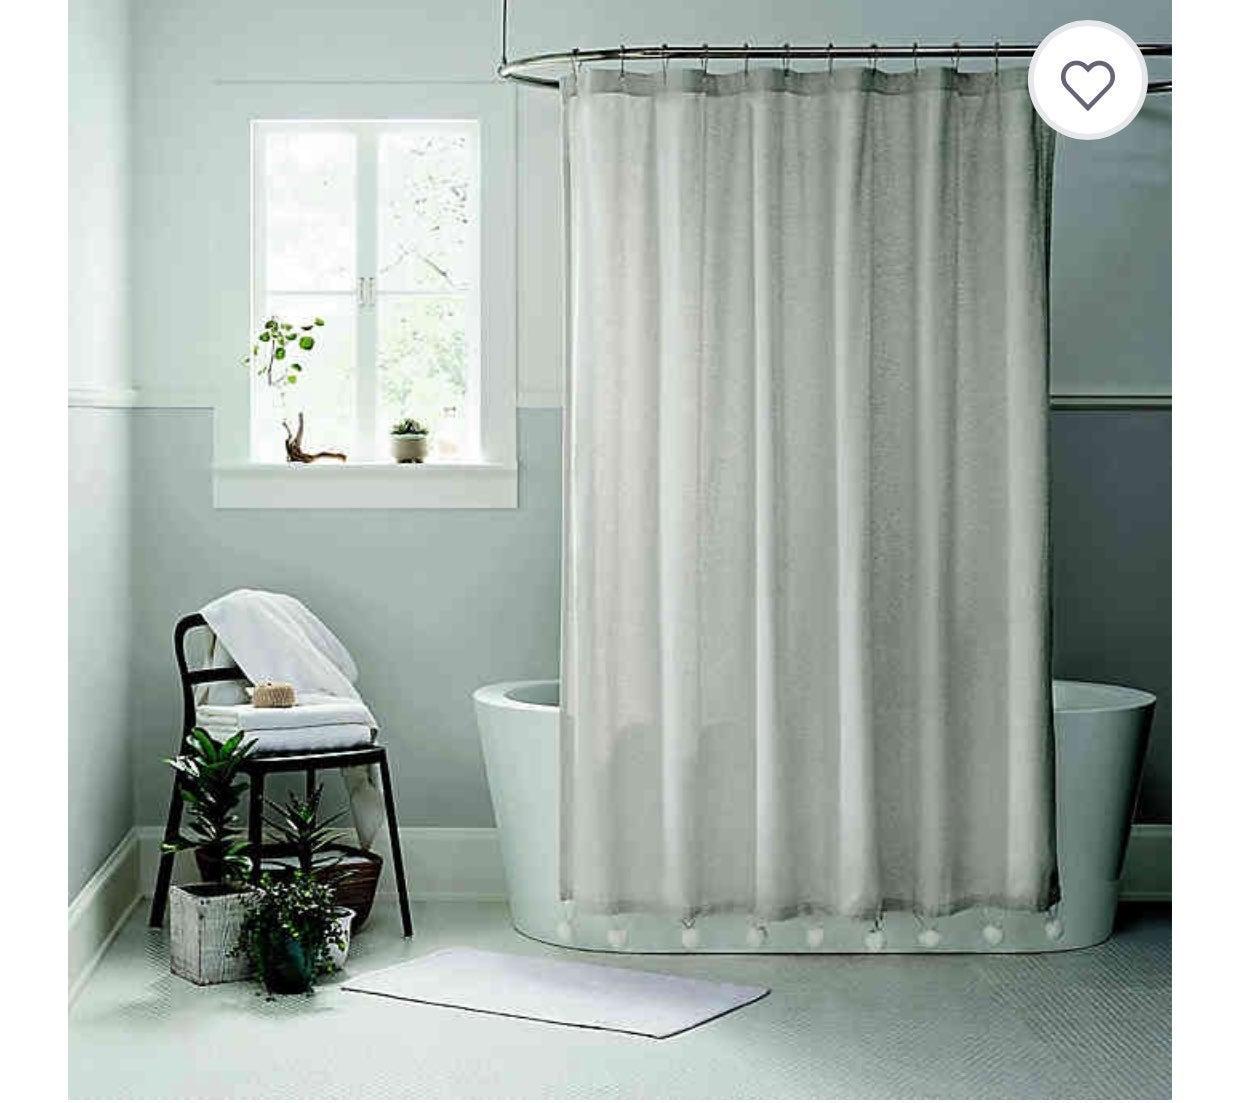 NEW Toro Ugg Shower Curtain Oatmeal